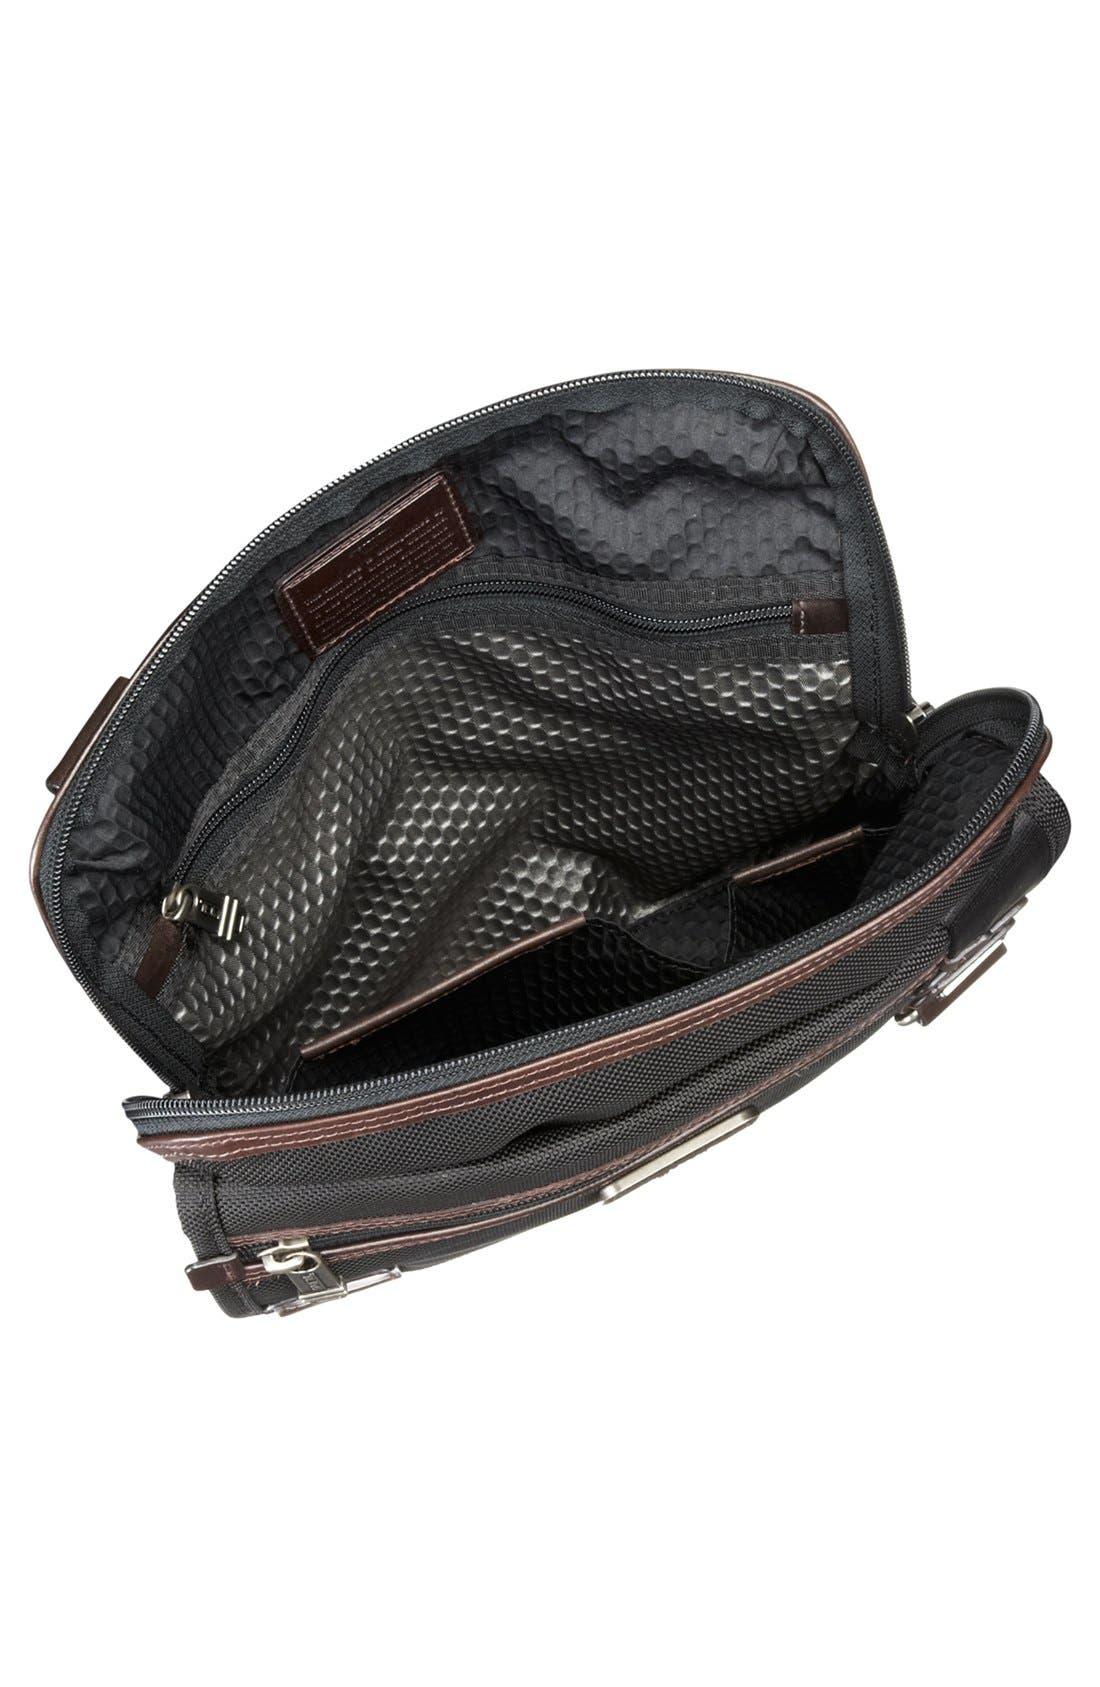 TUMI,                             'Alpha Bravo - Annapolis' Zip Flap Messenger Bag,                             Alternate thumbnail 2, color,                             001